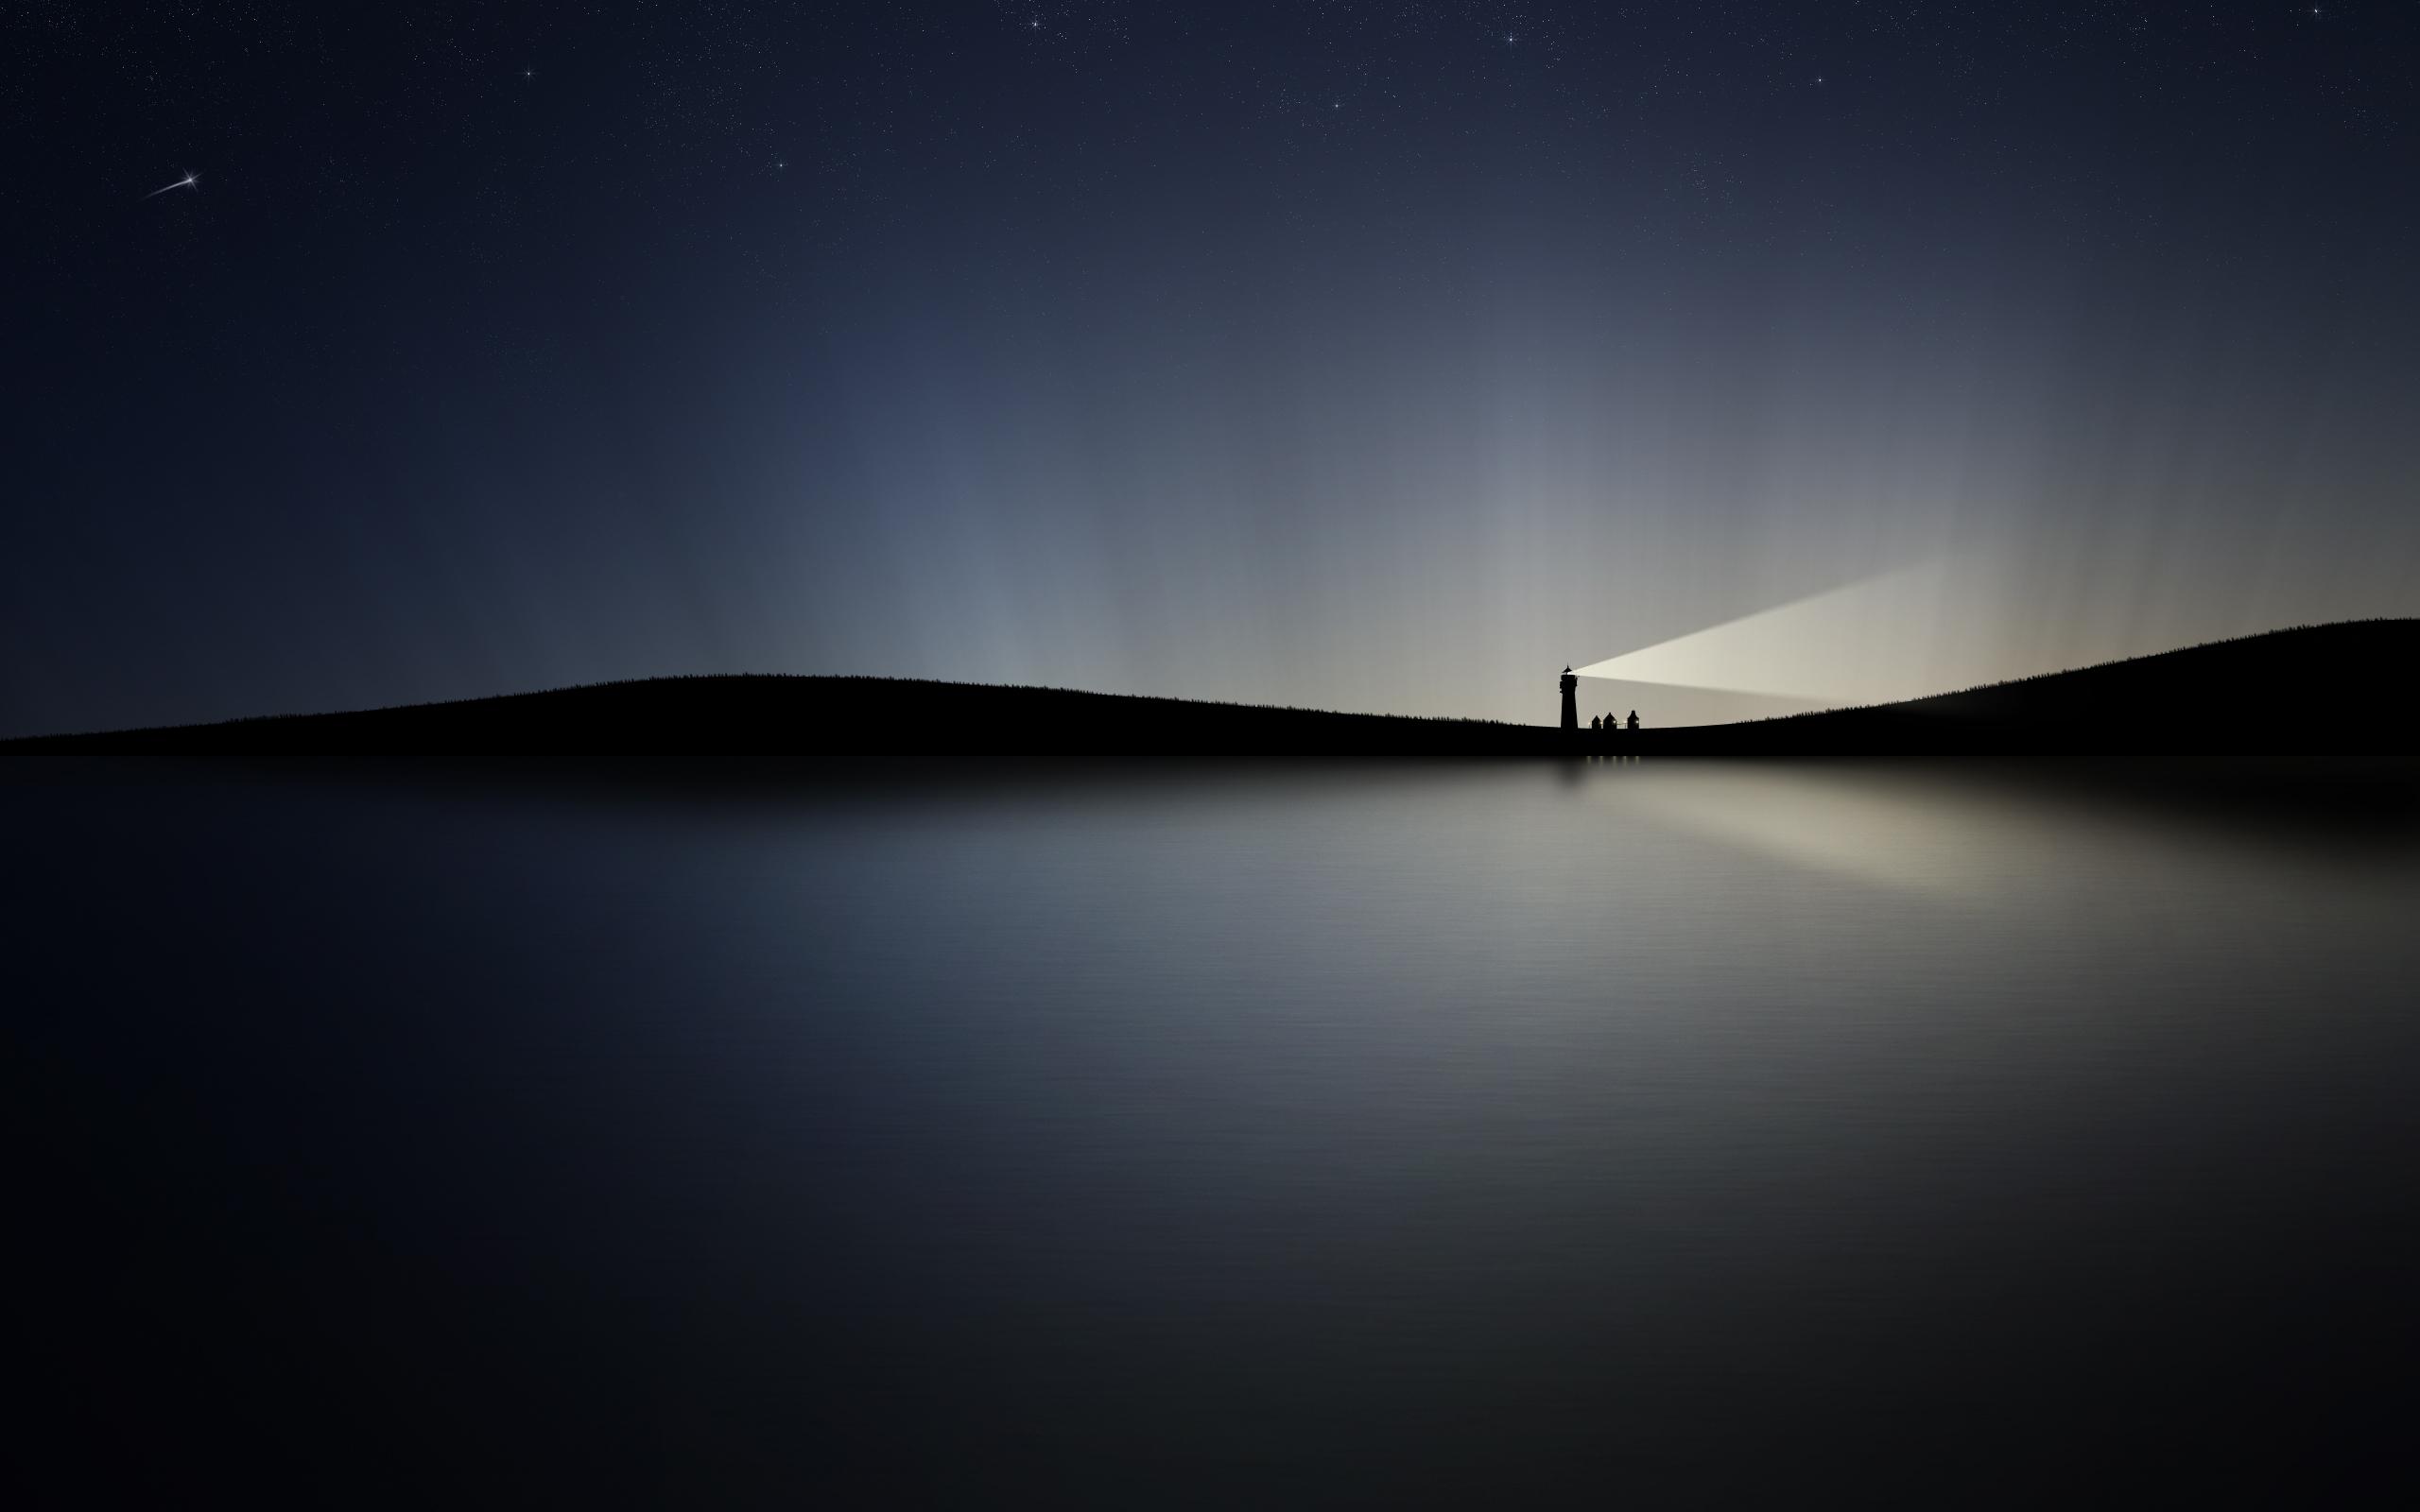 Desktop Night Sky HD Wallpapers 2560x1600